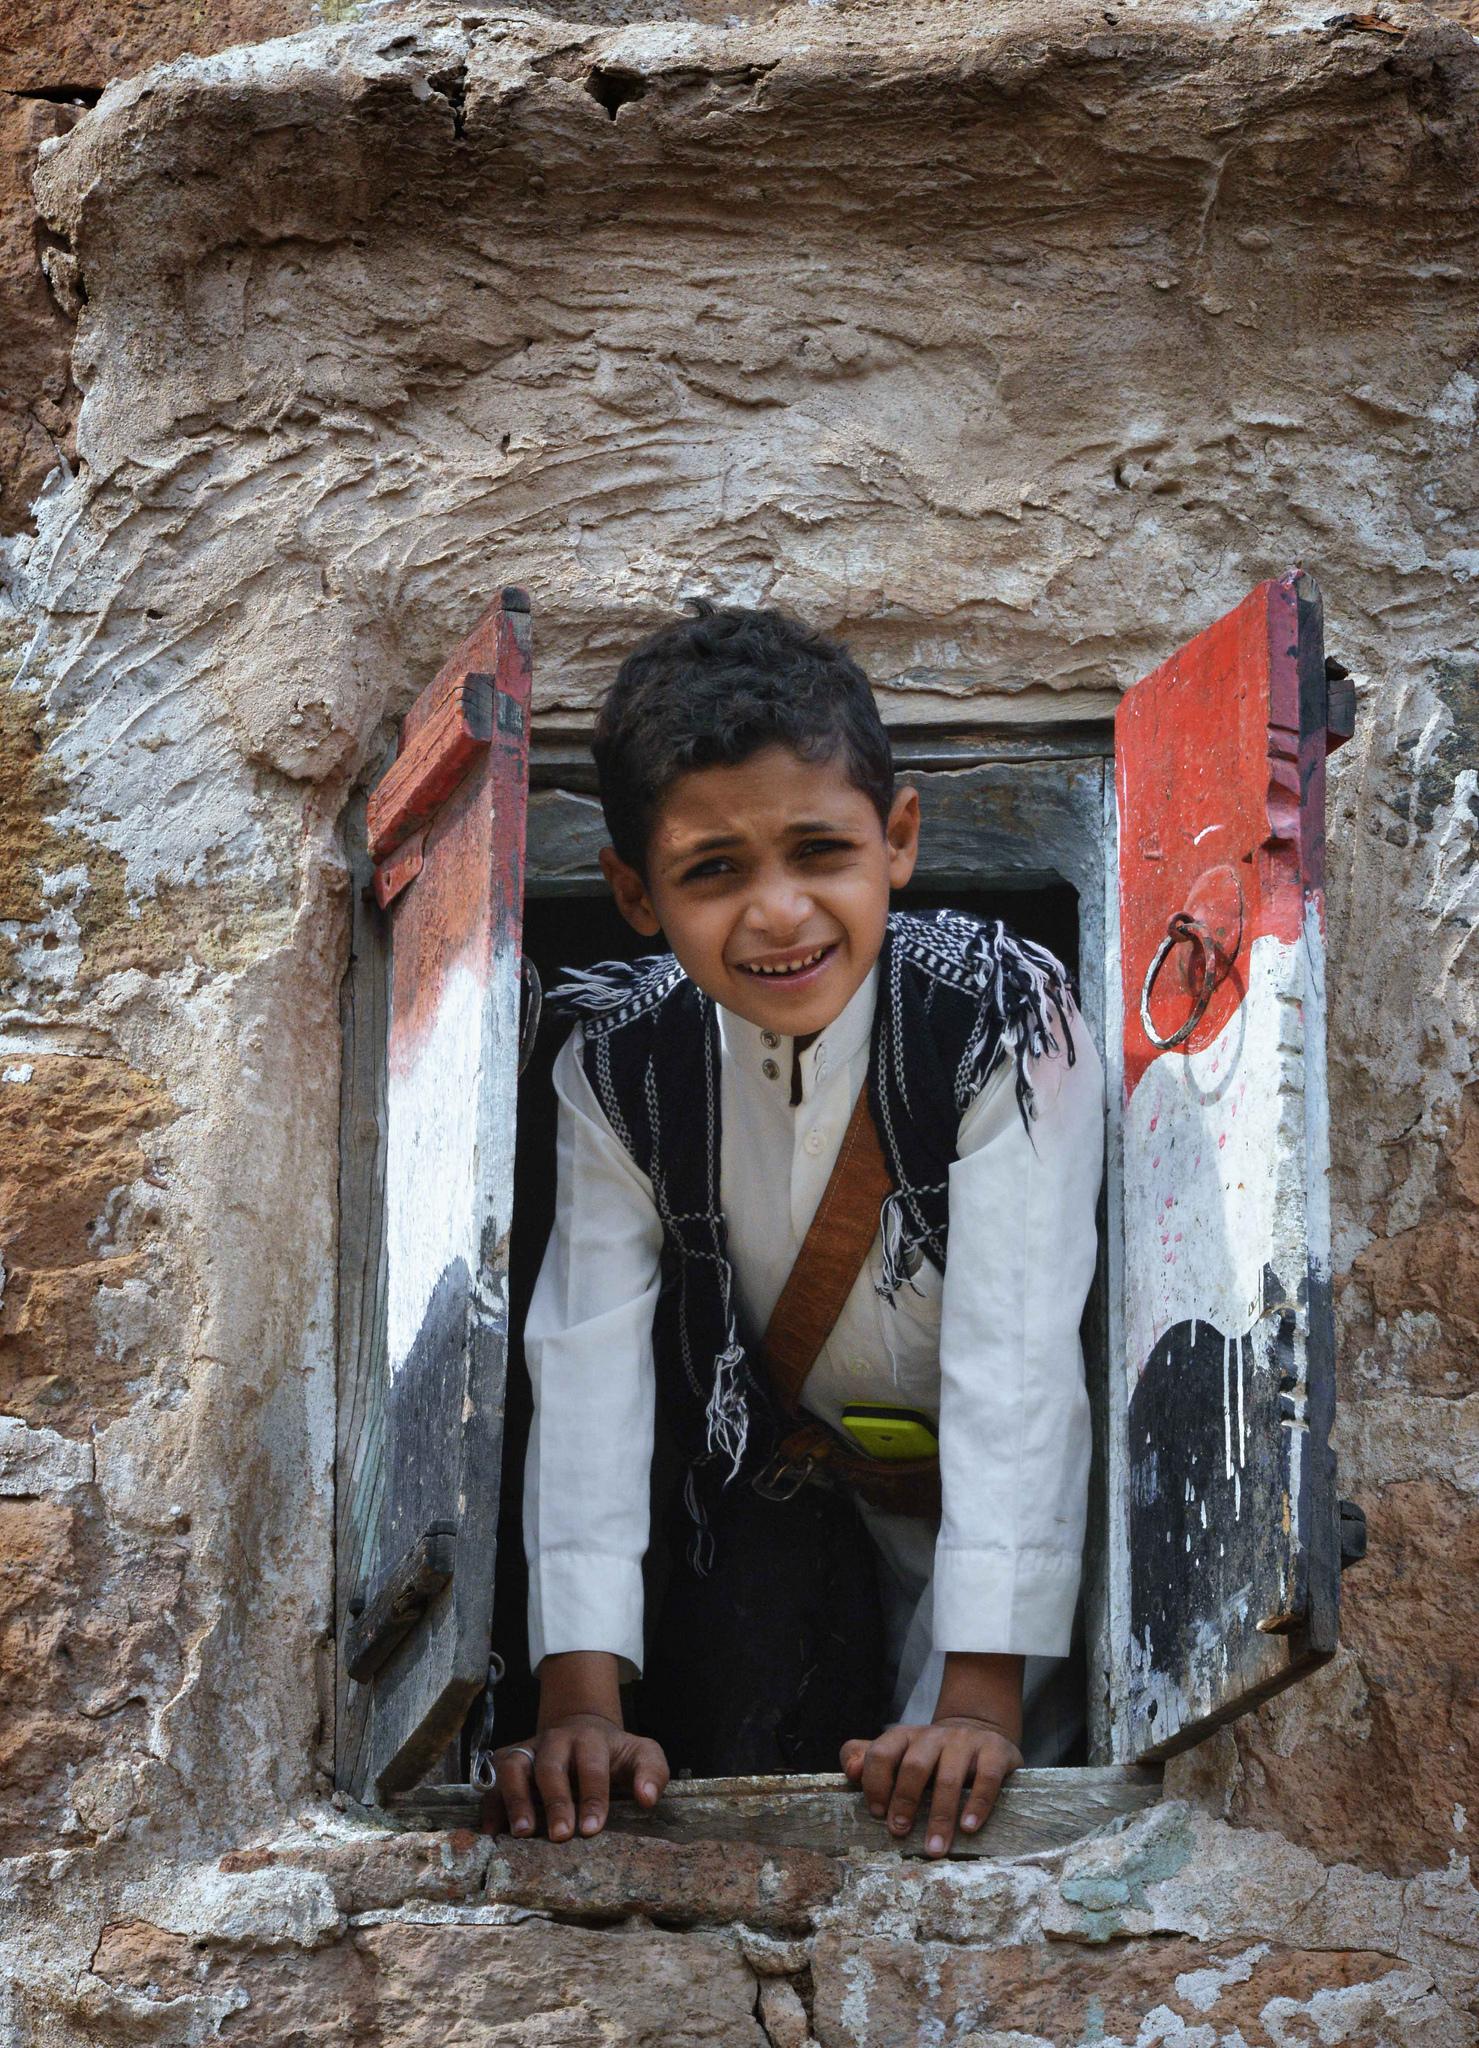 Flickr - Yaman child 4 - Rod Waddington